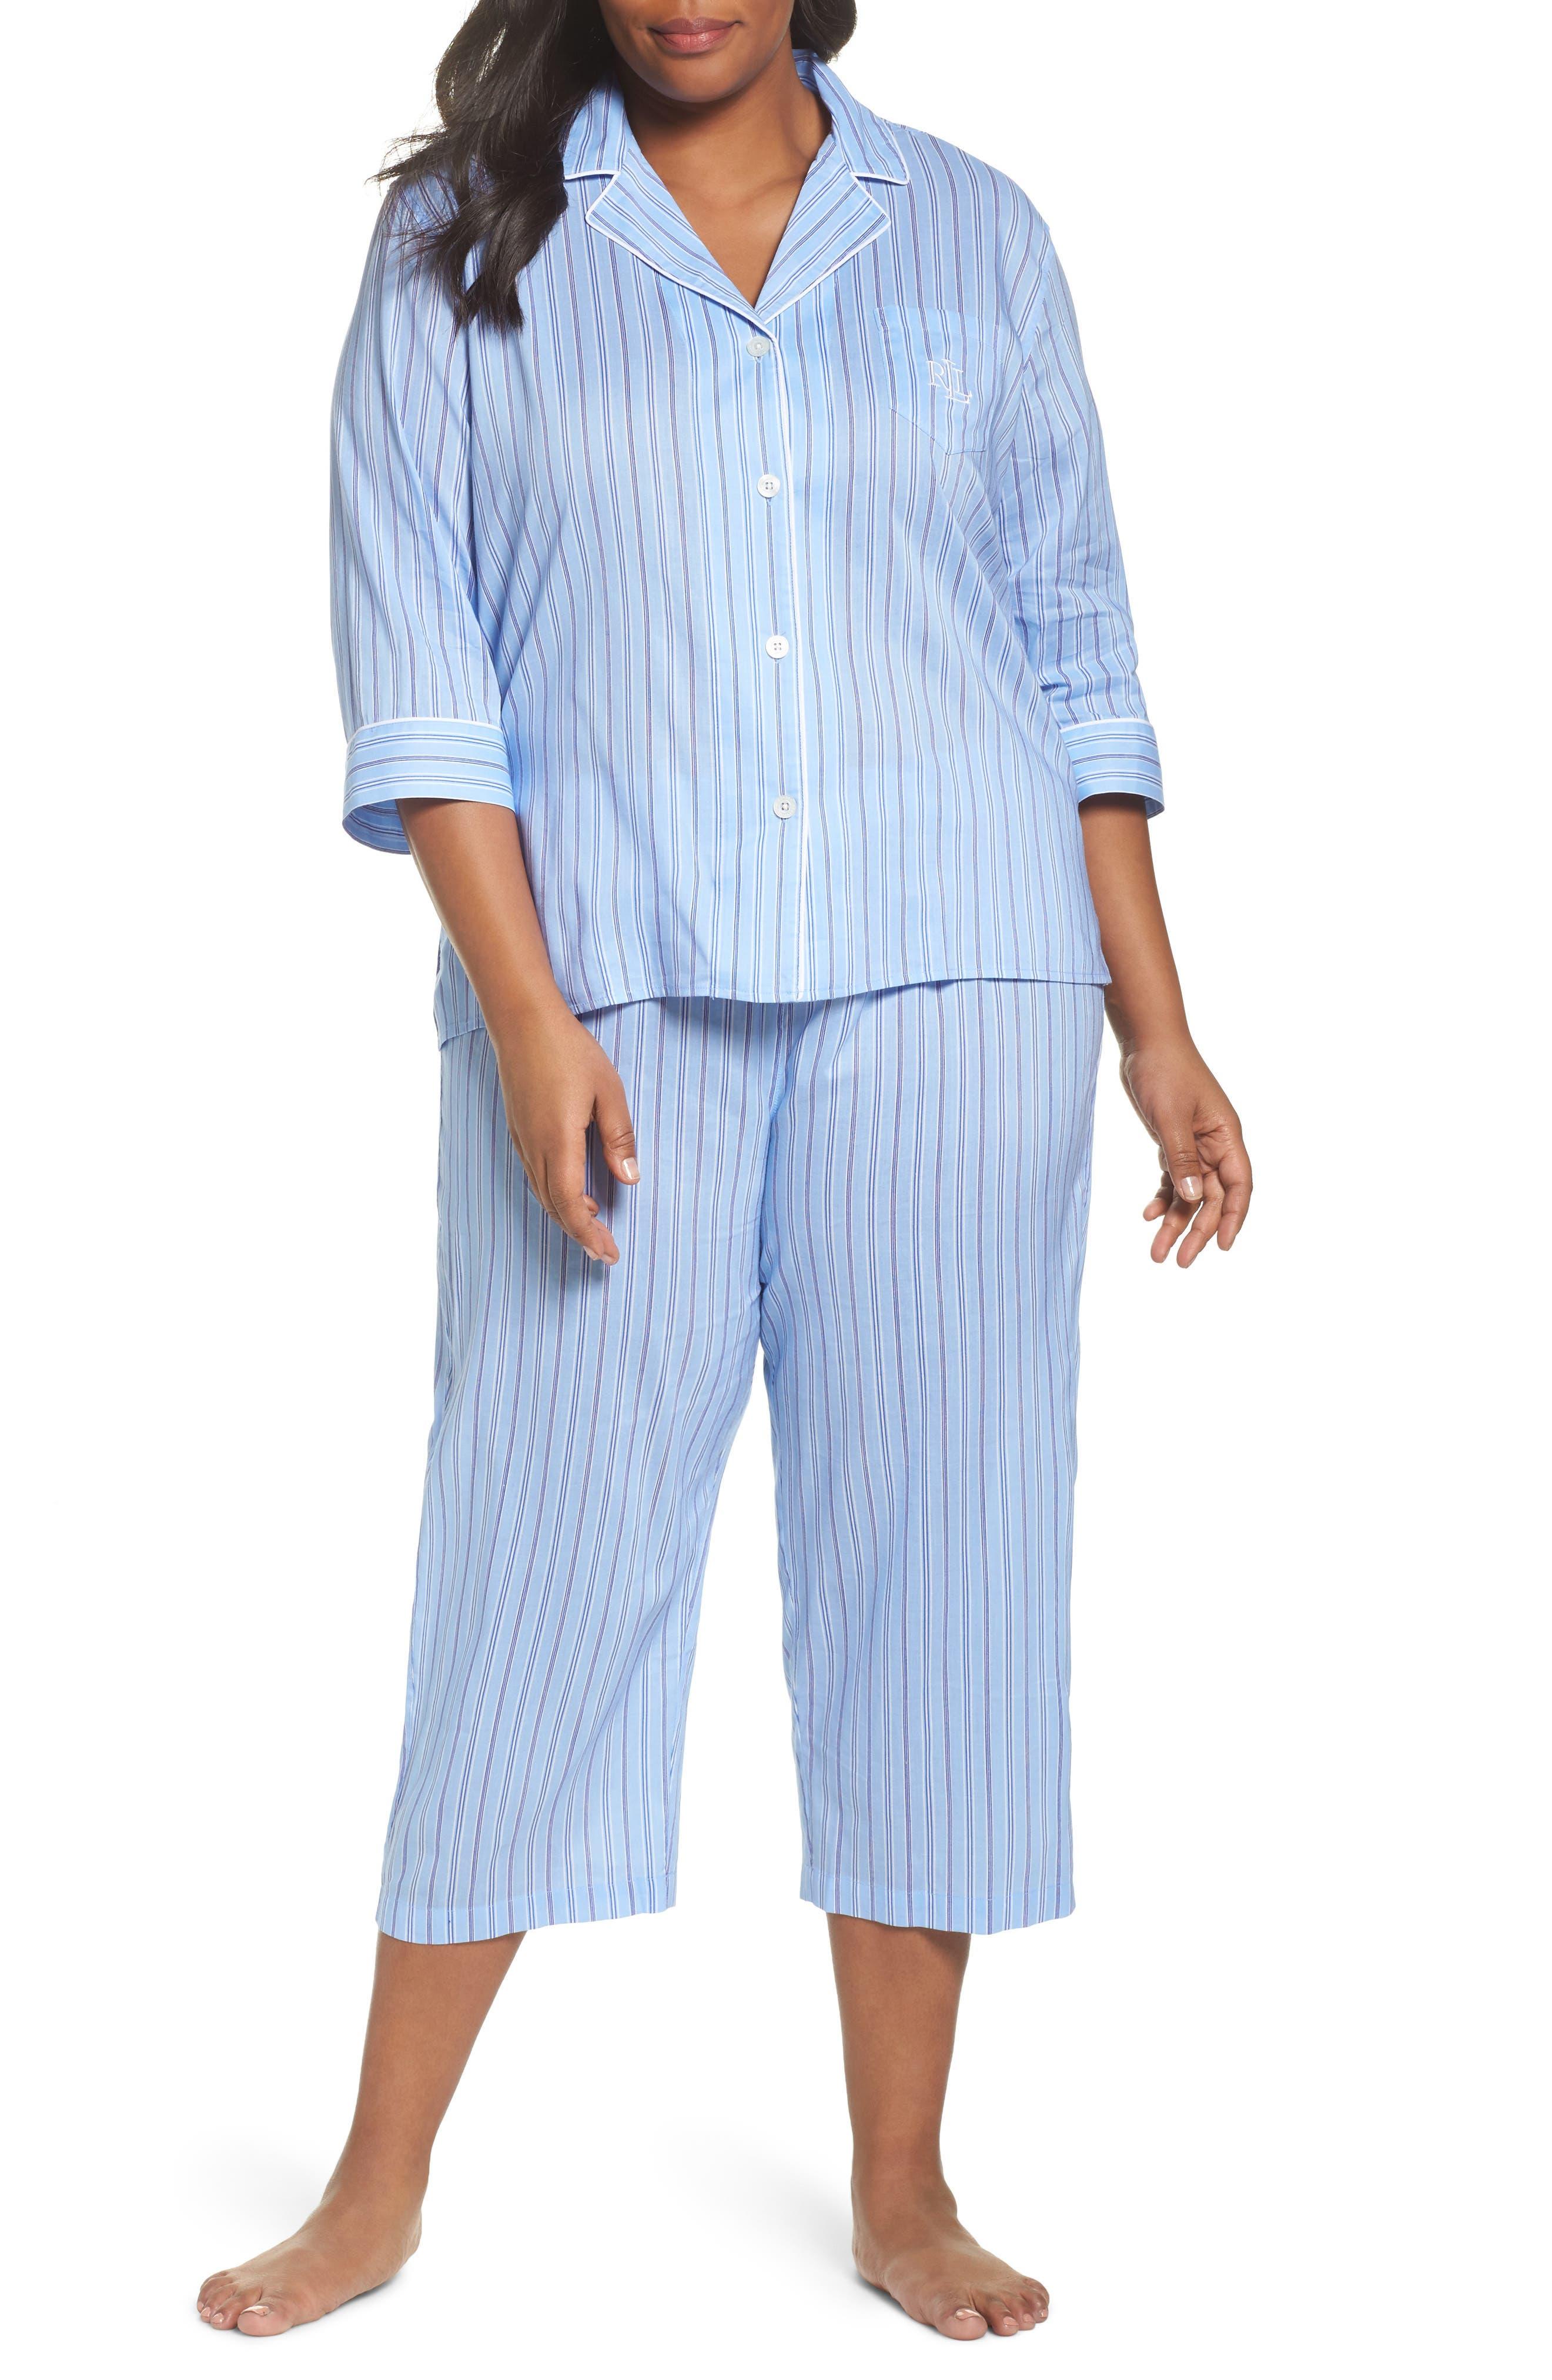 Capri Pajamas,                             Main thumbnail 1, color,                             486